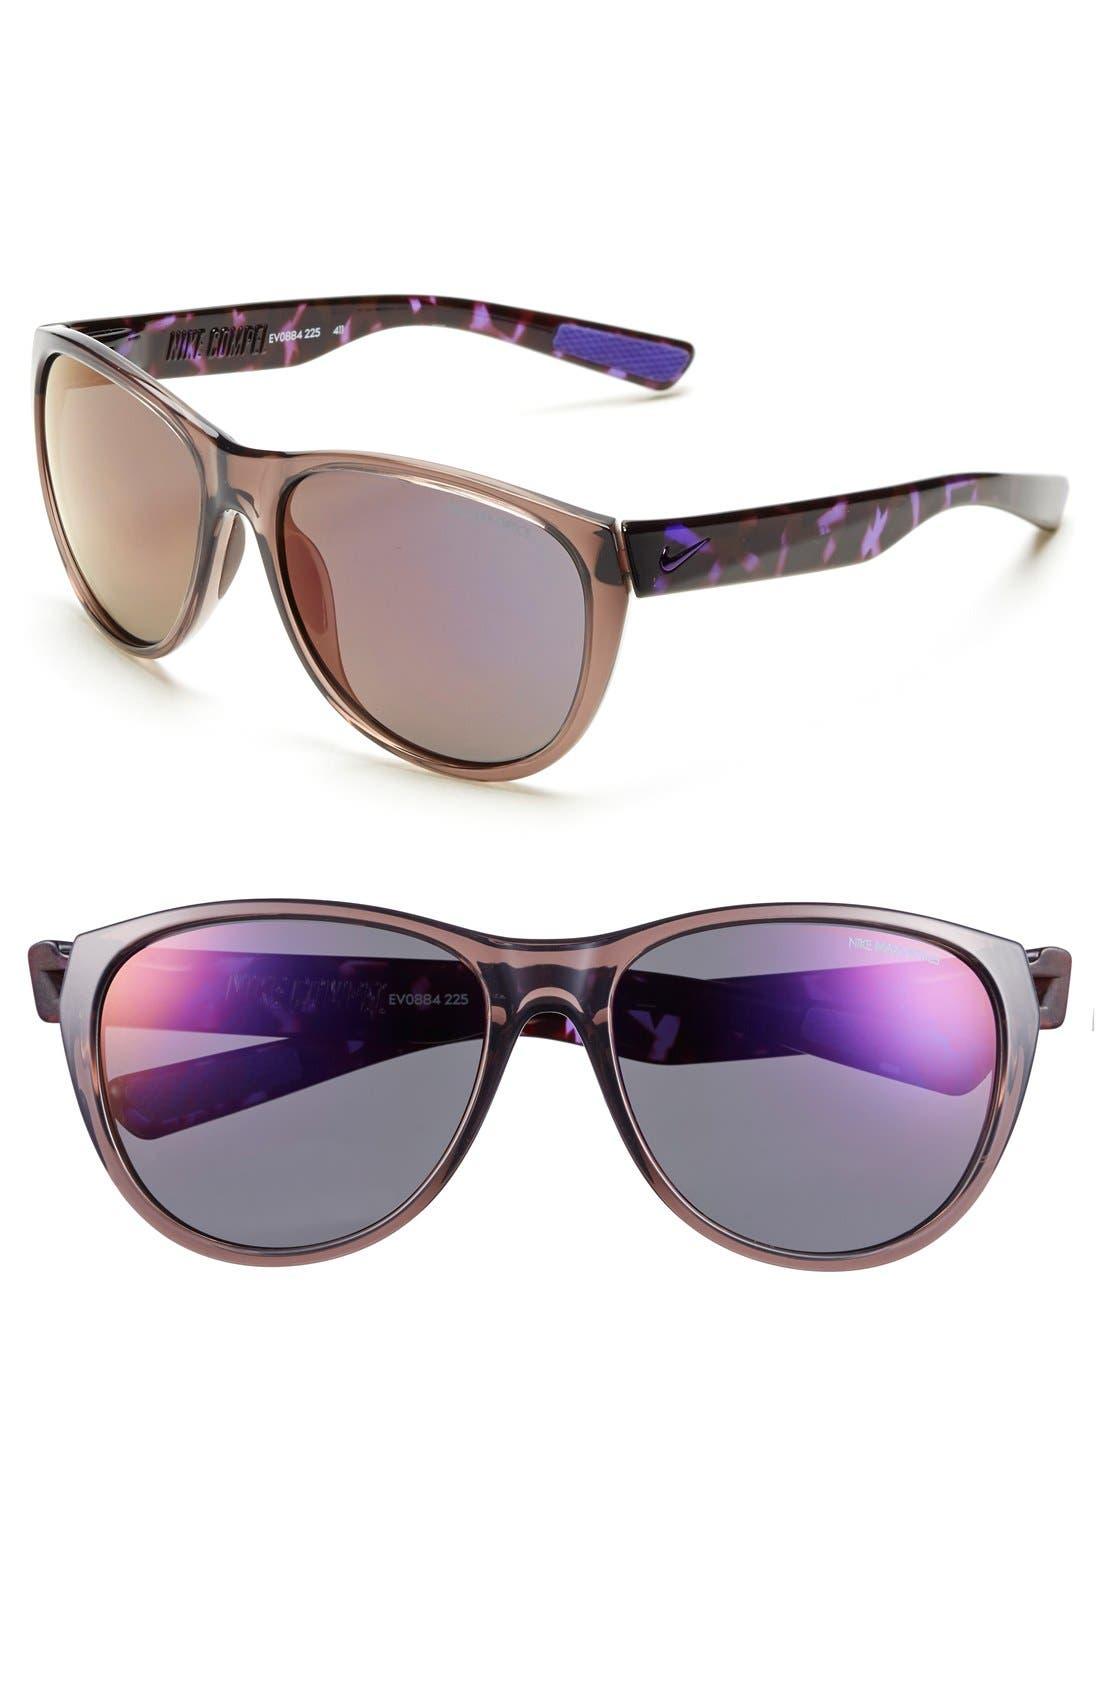 Main Image - Nike 'Compel' 58mm Sunglasses